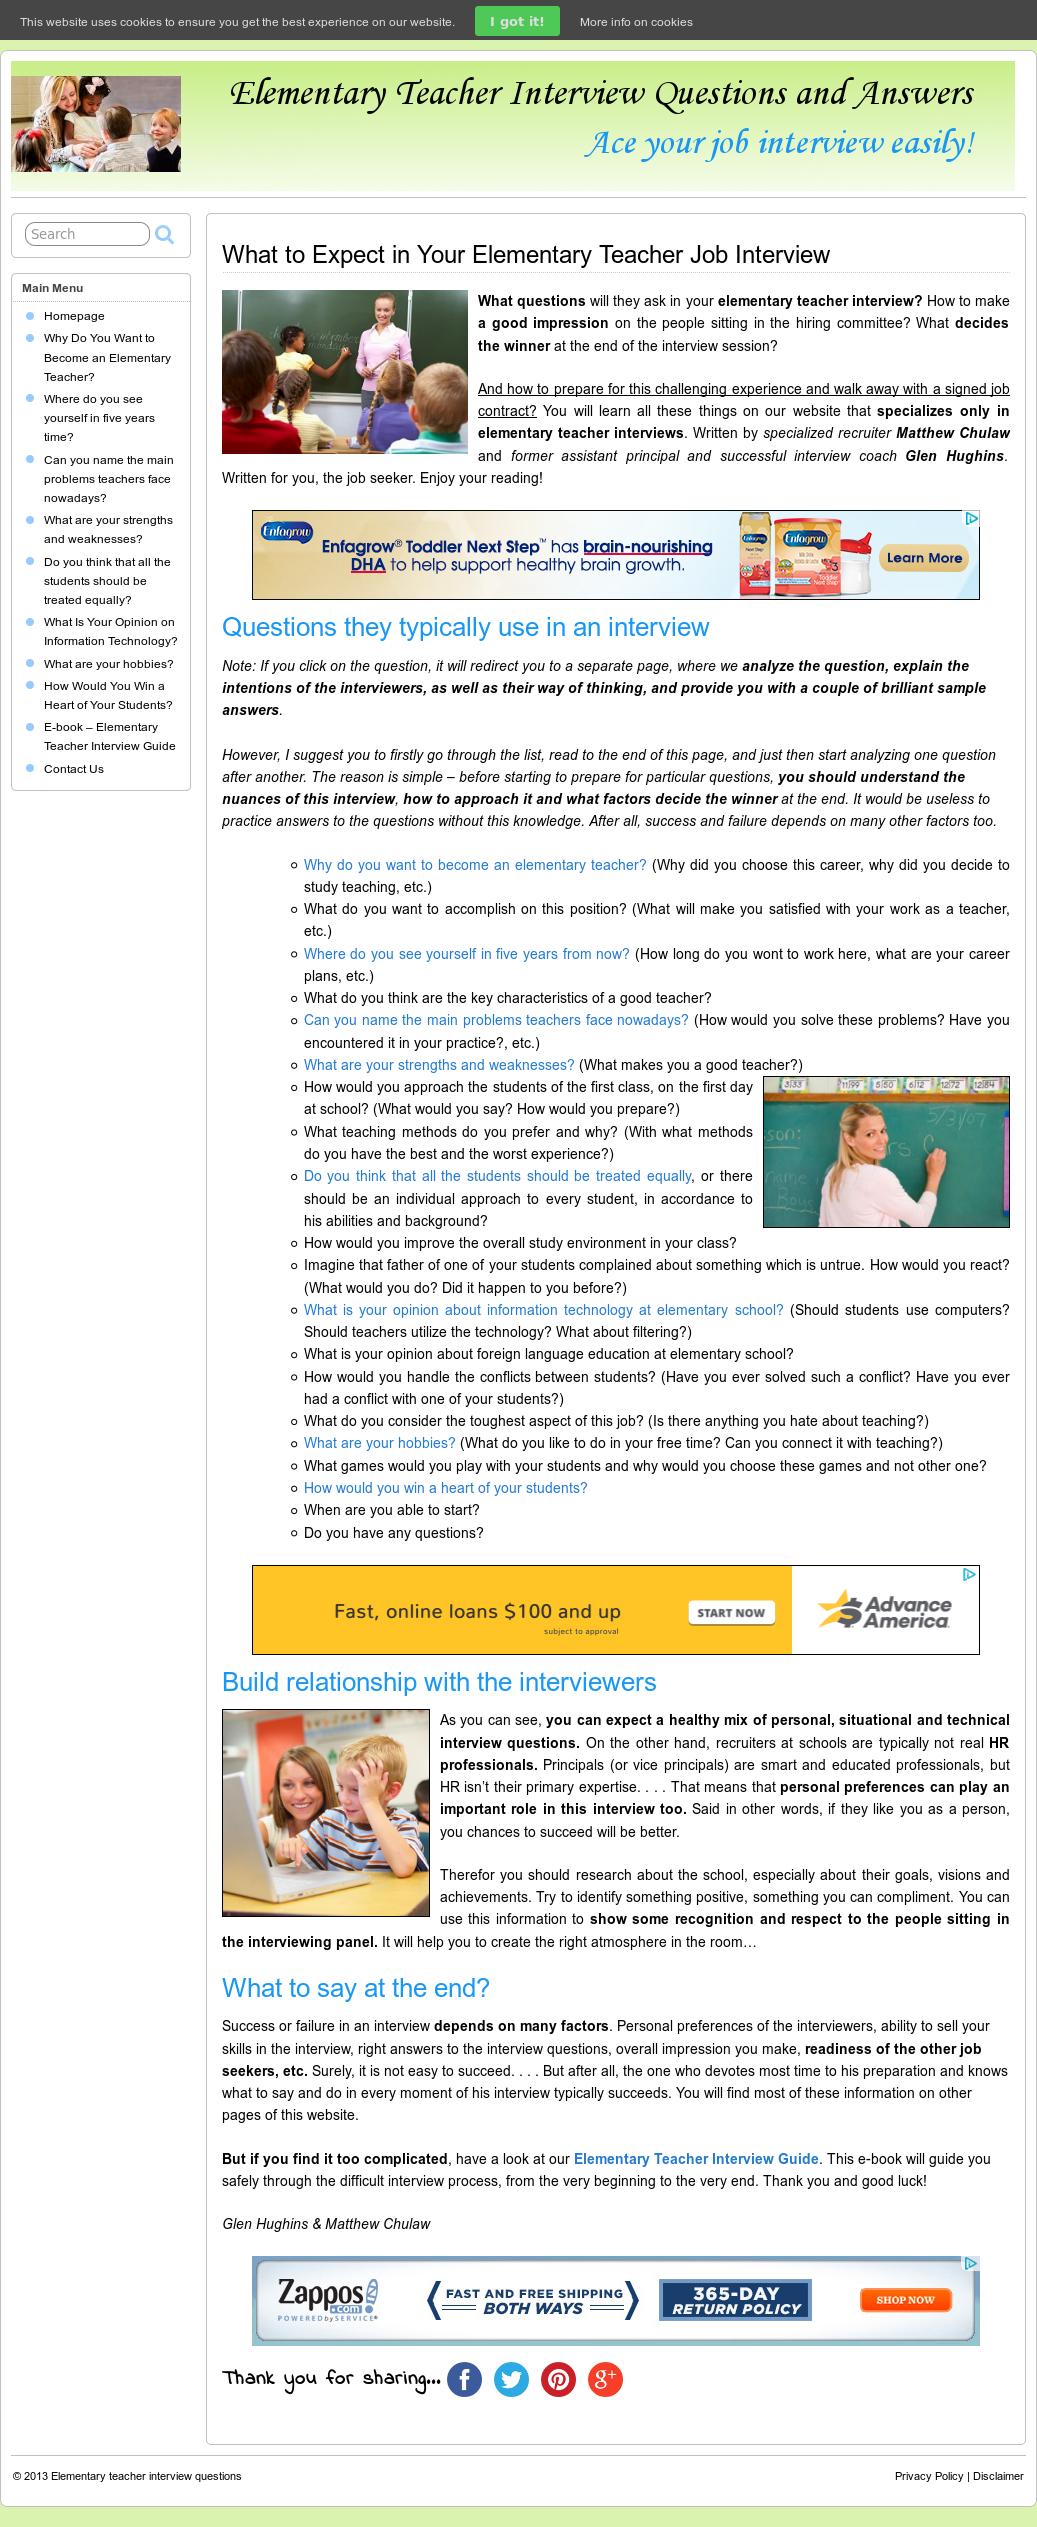 Elementary Teacher Interview Questions Competitors, Revenue